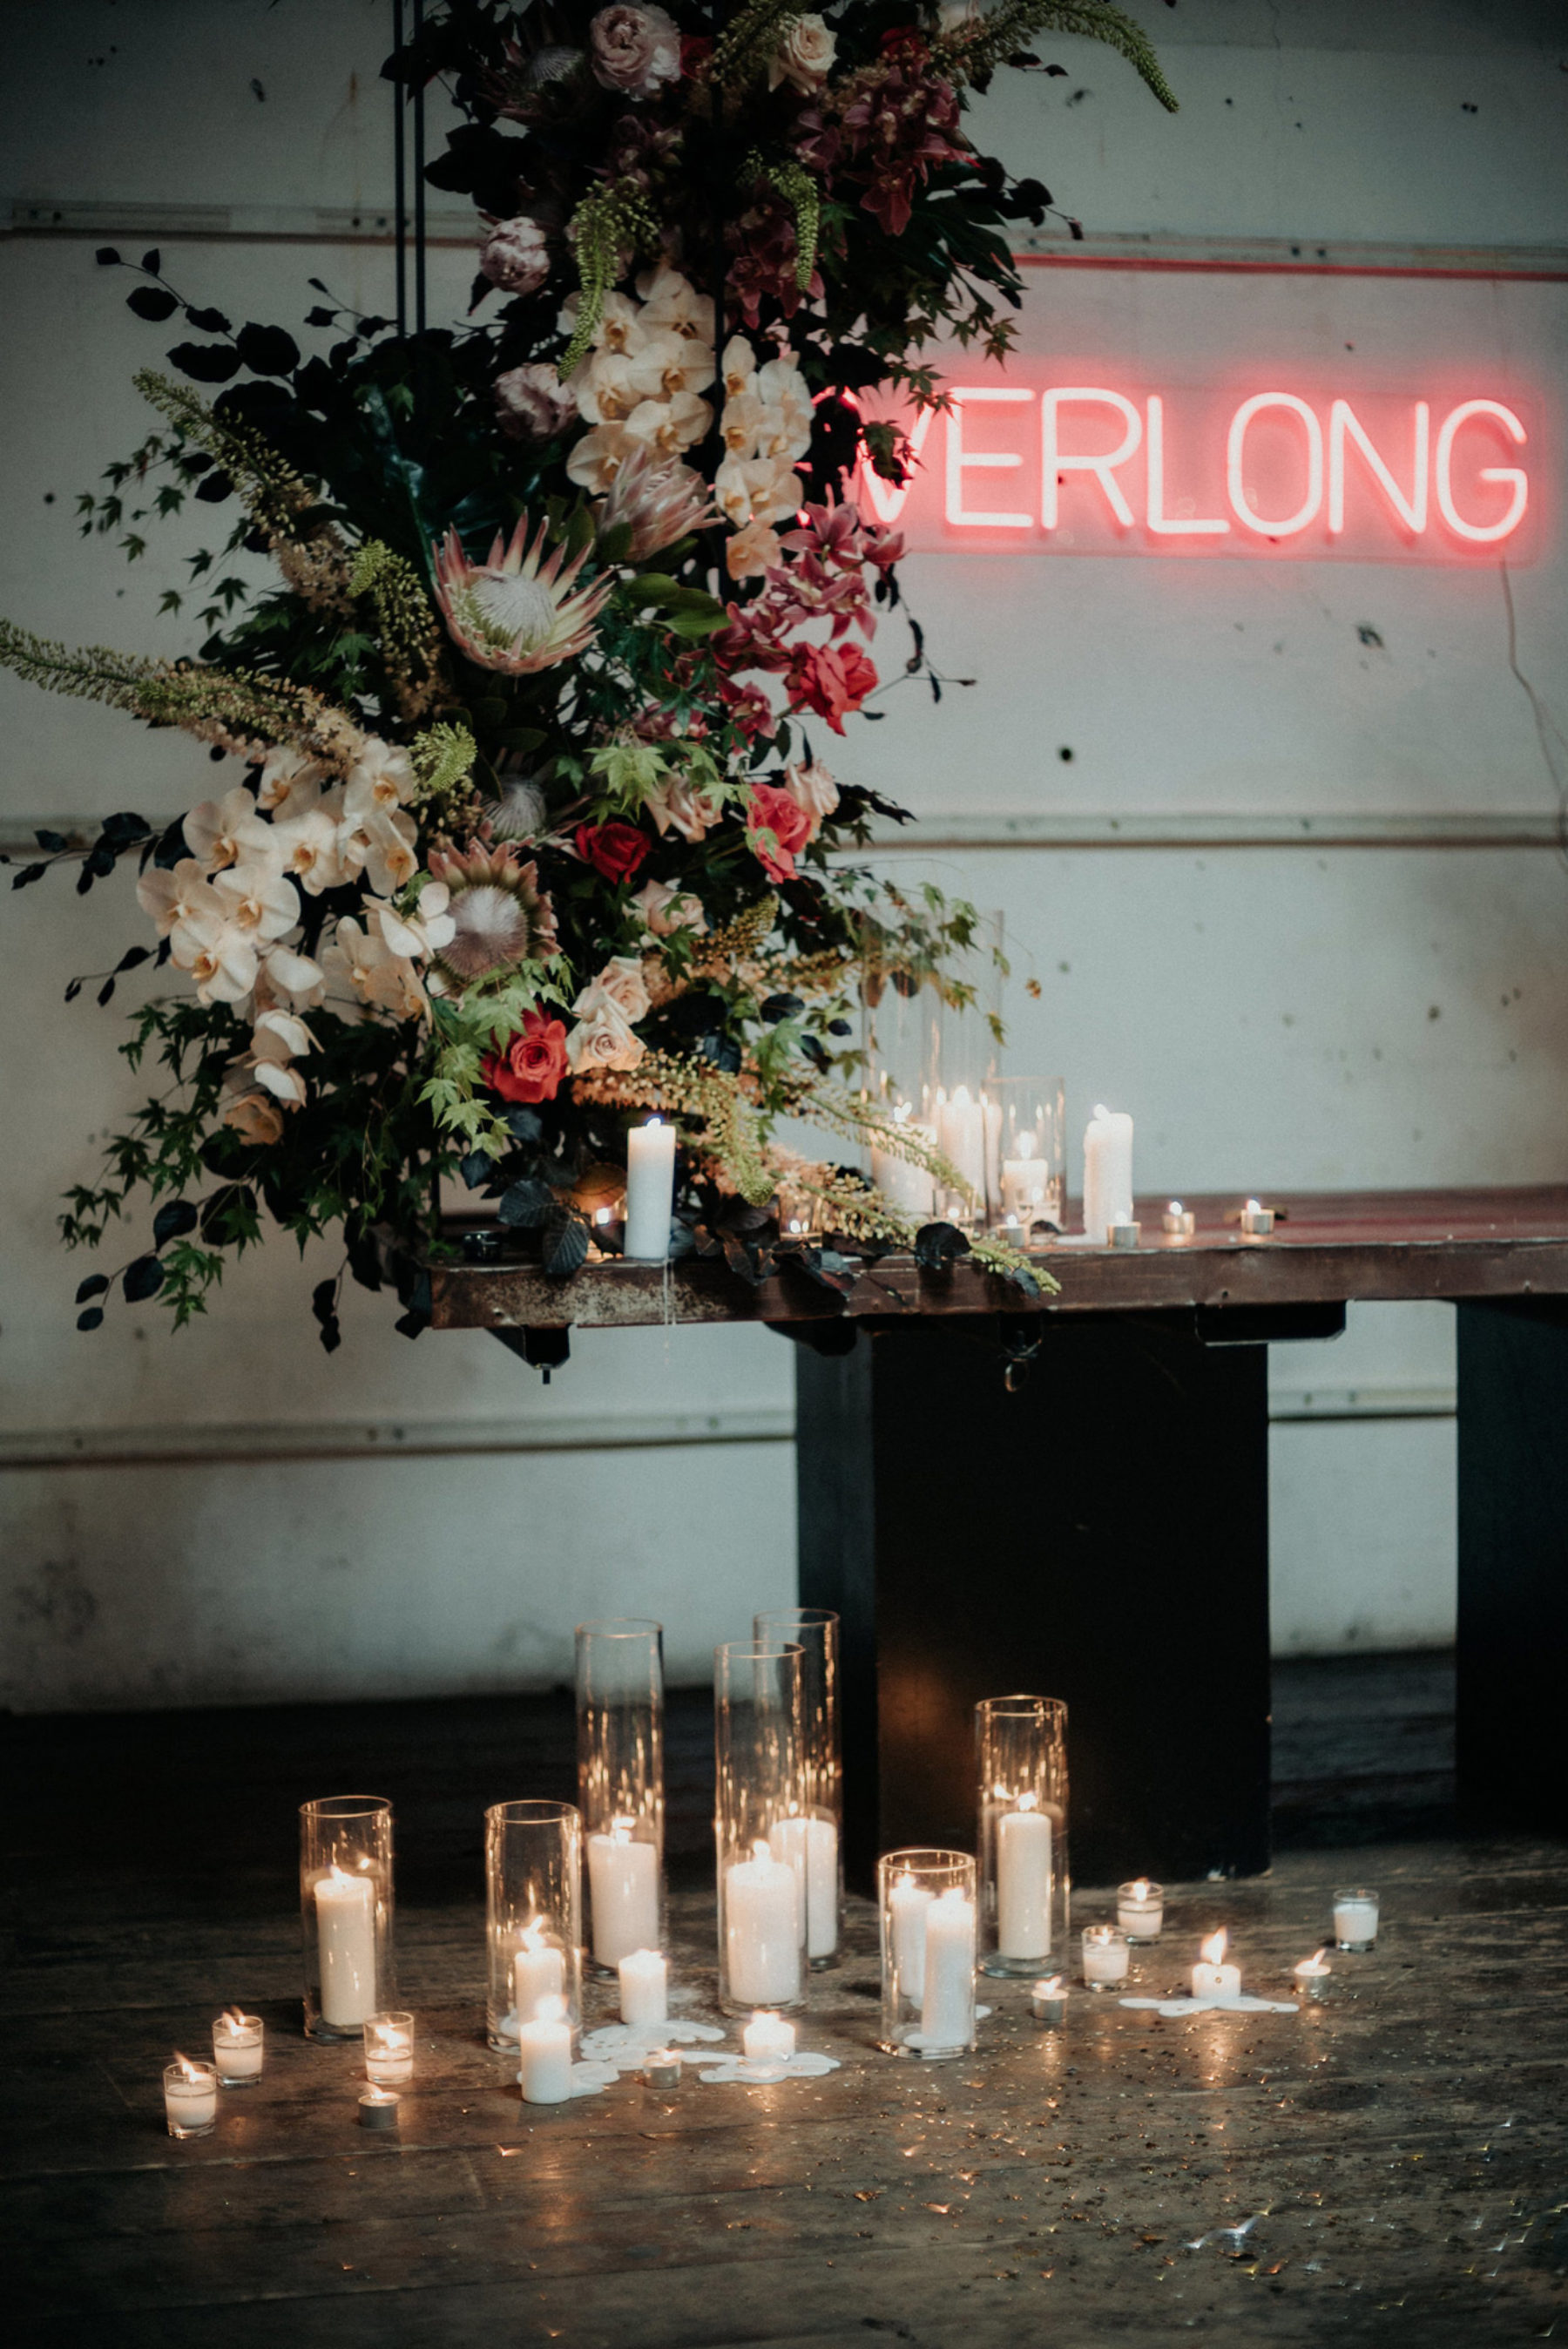 bang-bang-boogaloo-wedding-melbourne-04-1800x0-c-default.jpg